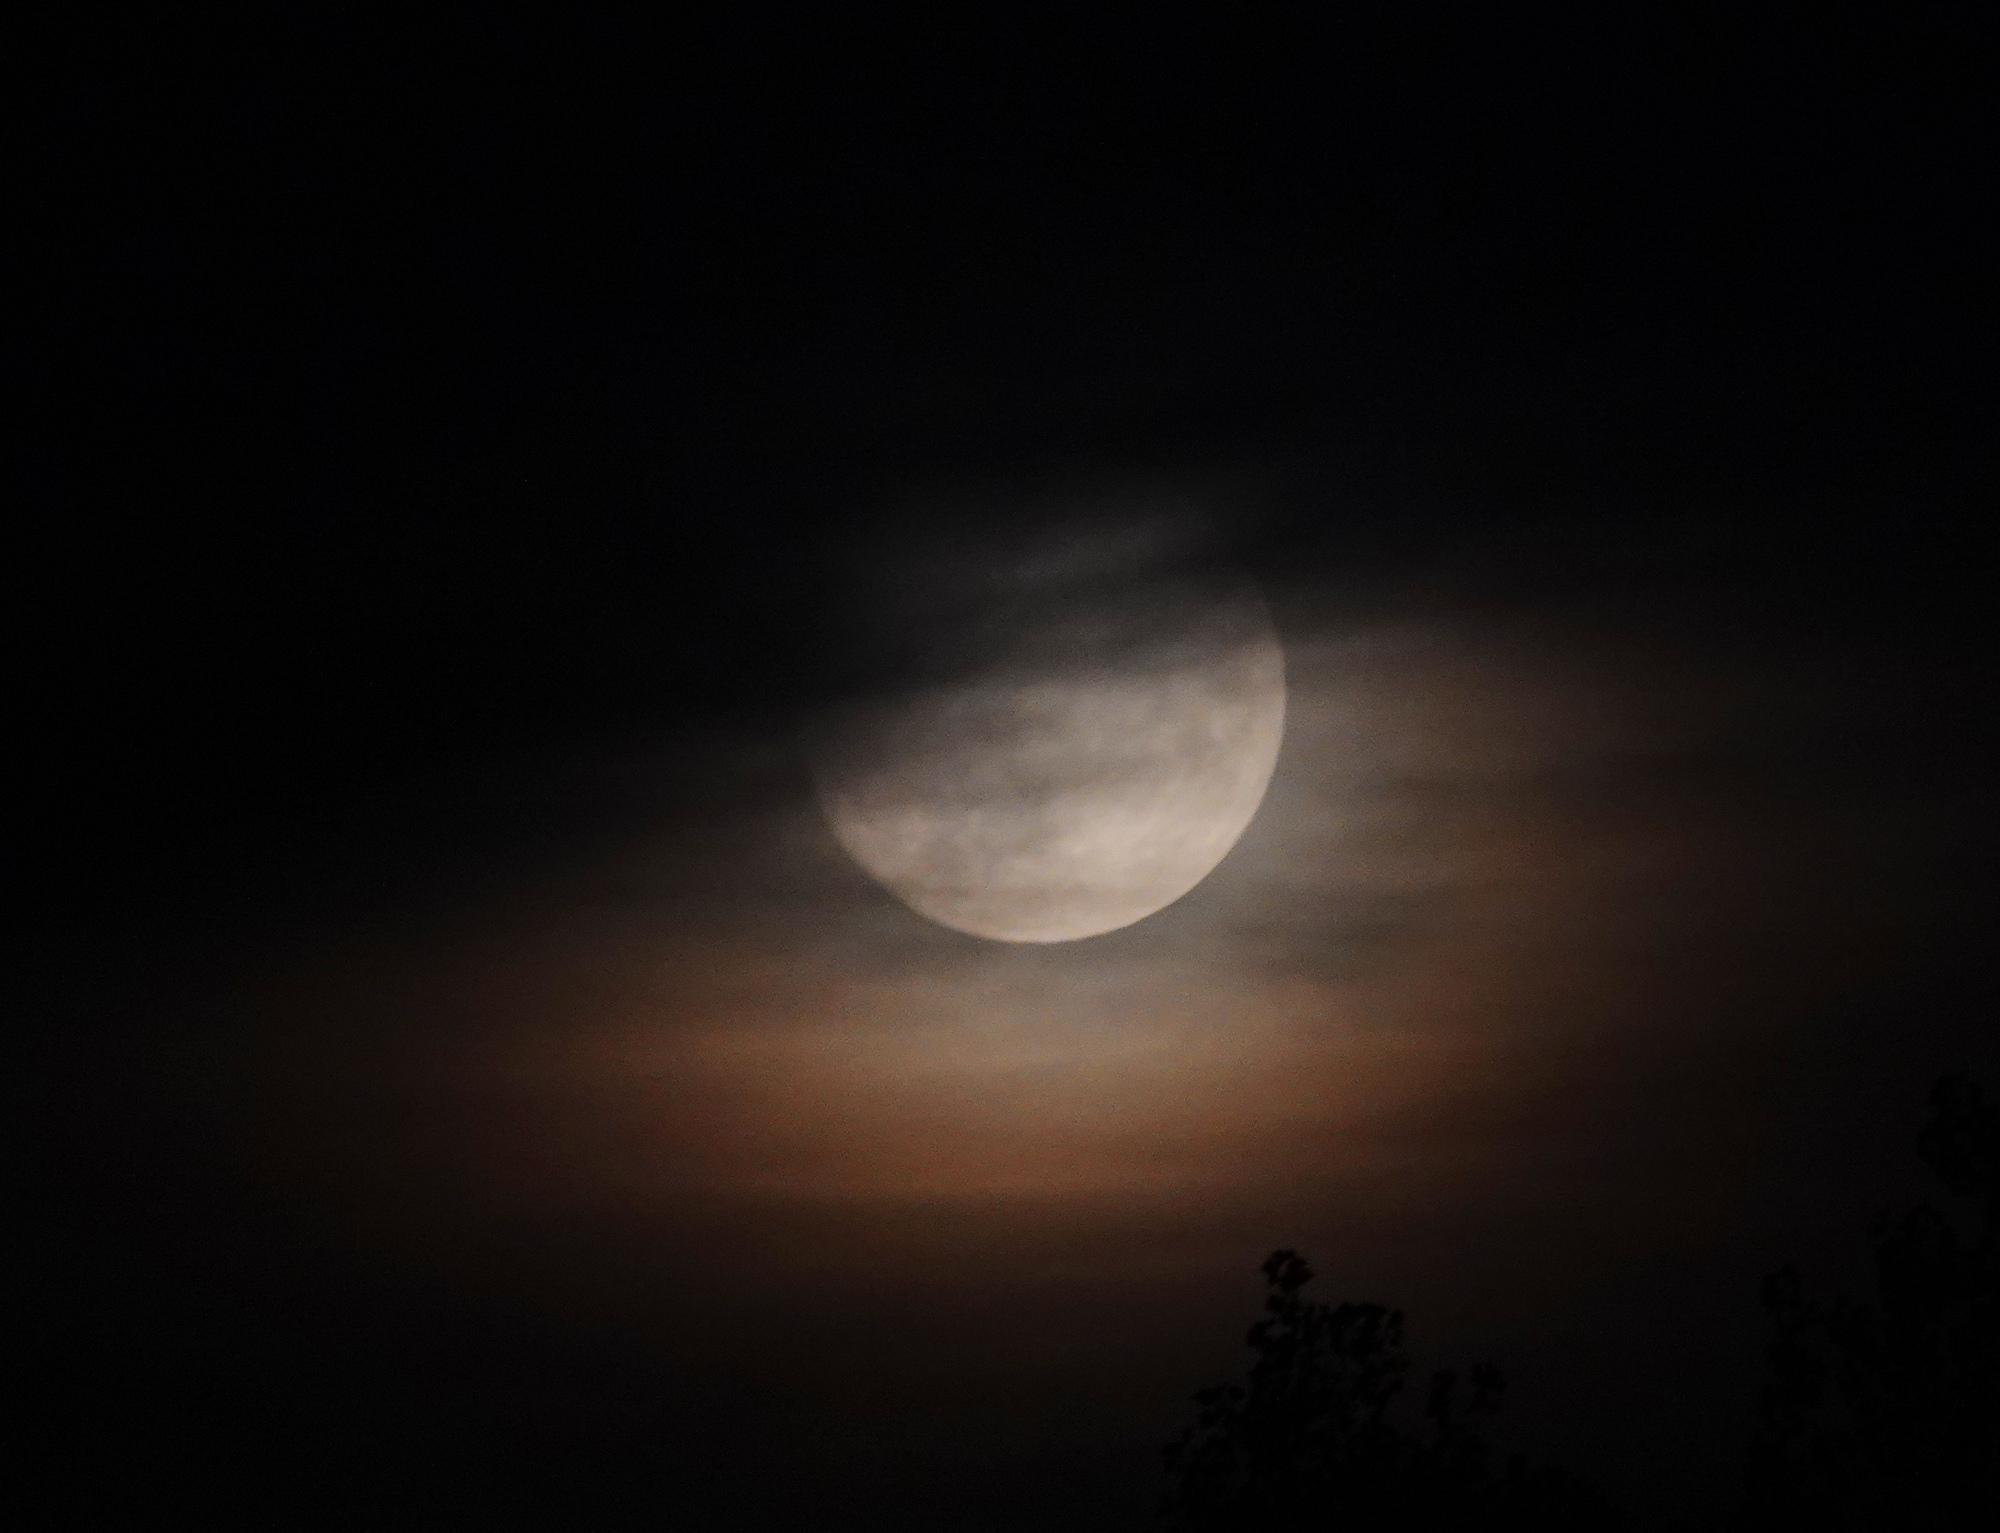 lune2.thumb.JPG.58d538742f23ae4132fca732dfbe2e76.JPG